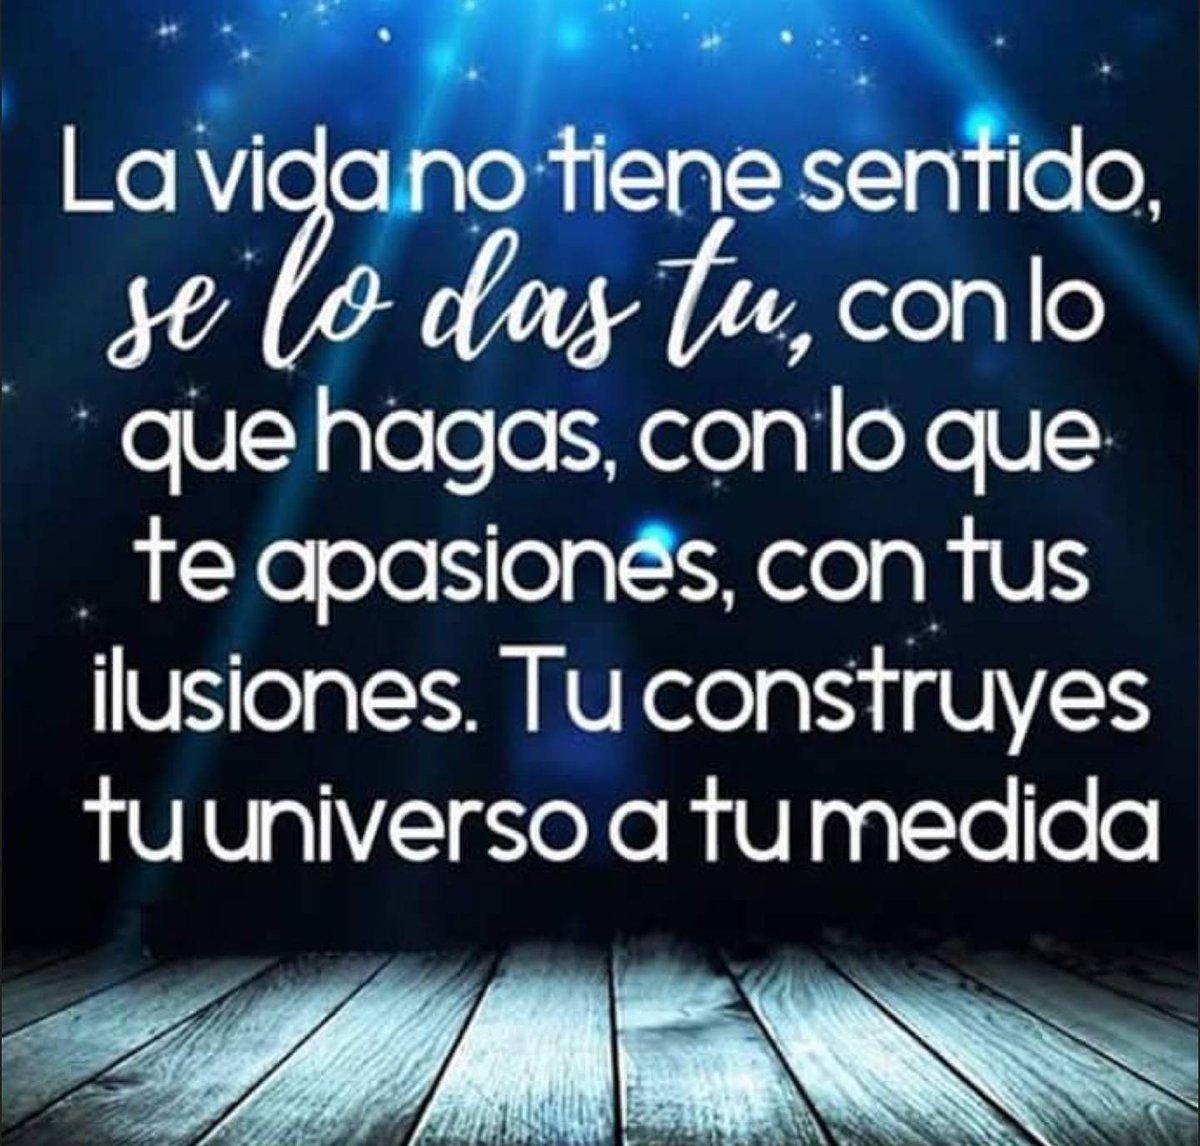 Quijotadas De Amor Twitterissä Quijotadasdeamor Se Lo